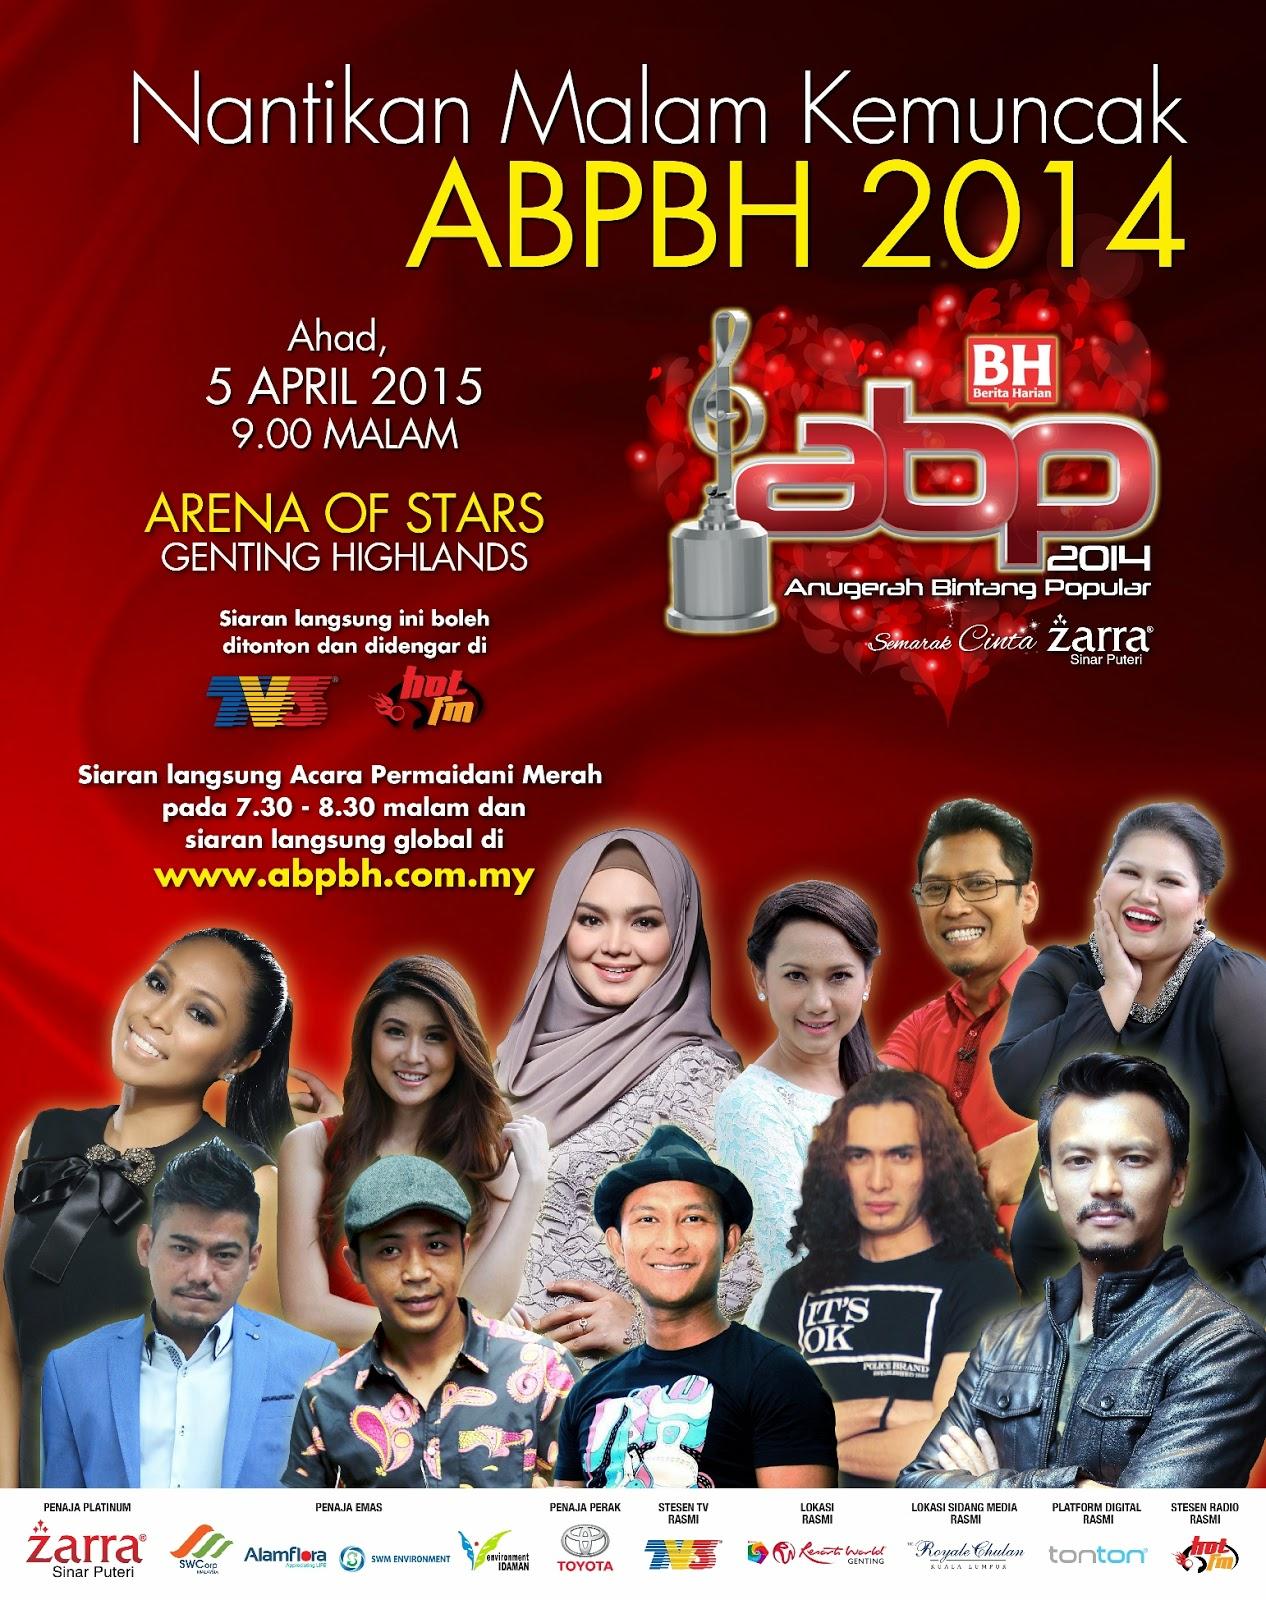 Anugerah Bintang Popular Berita Harian (ABPBH)2014